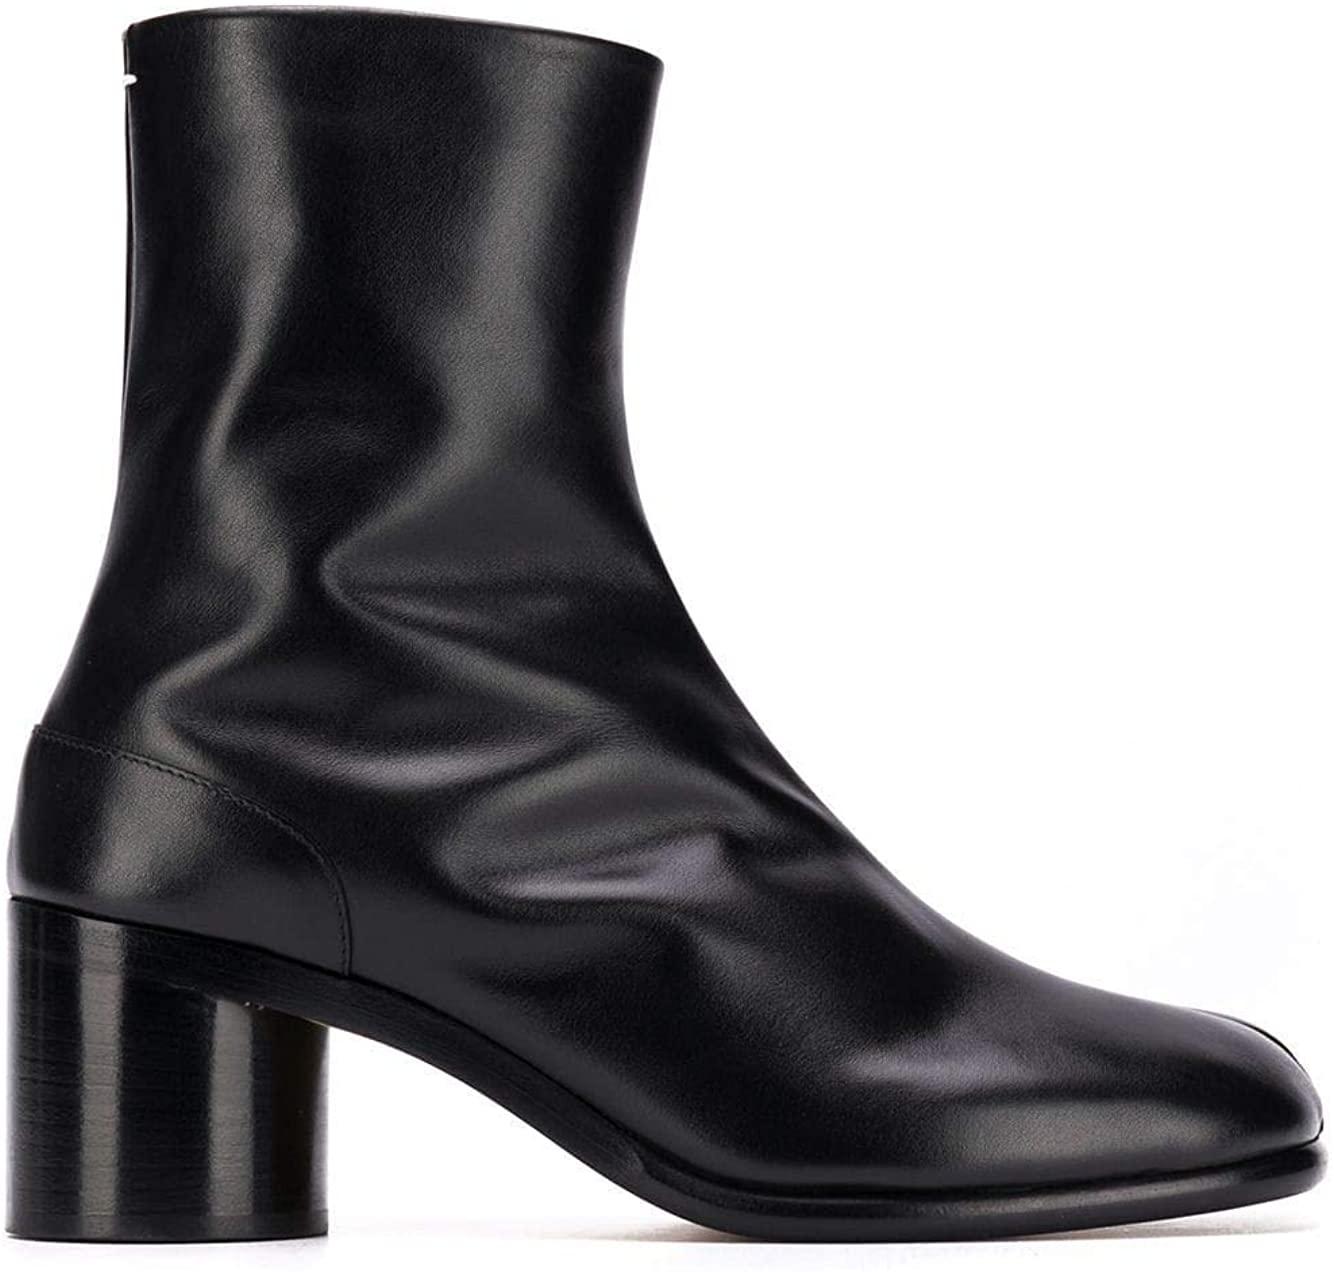 Maison Margiela Luxury Fashion Man S57WU0132PR516T8013 Black Leather Ankle Boots | Season Permanent